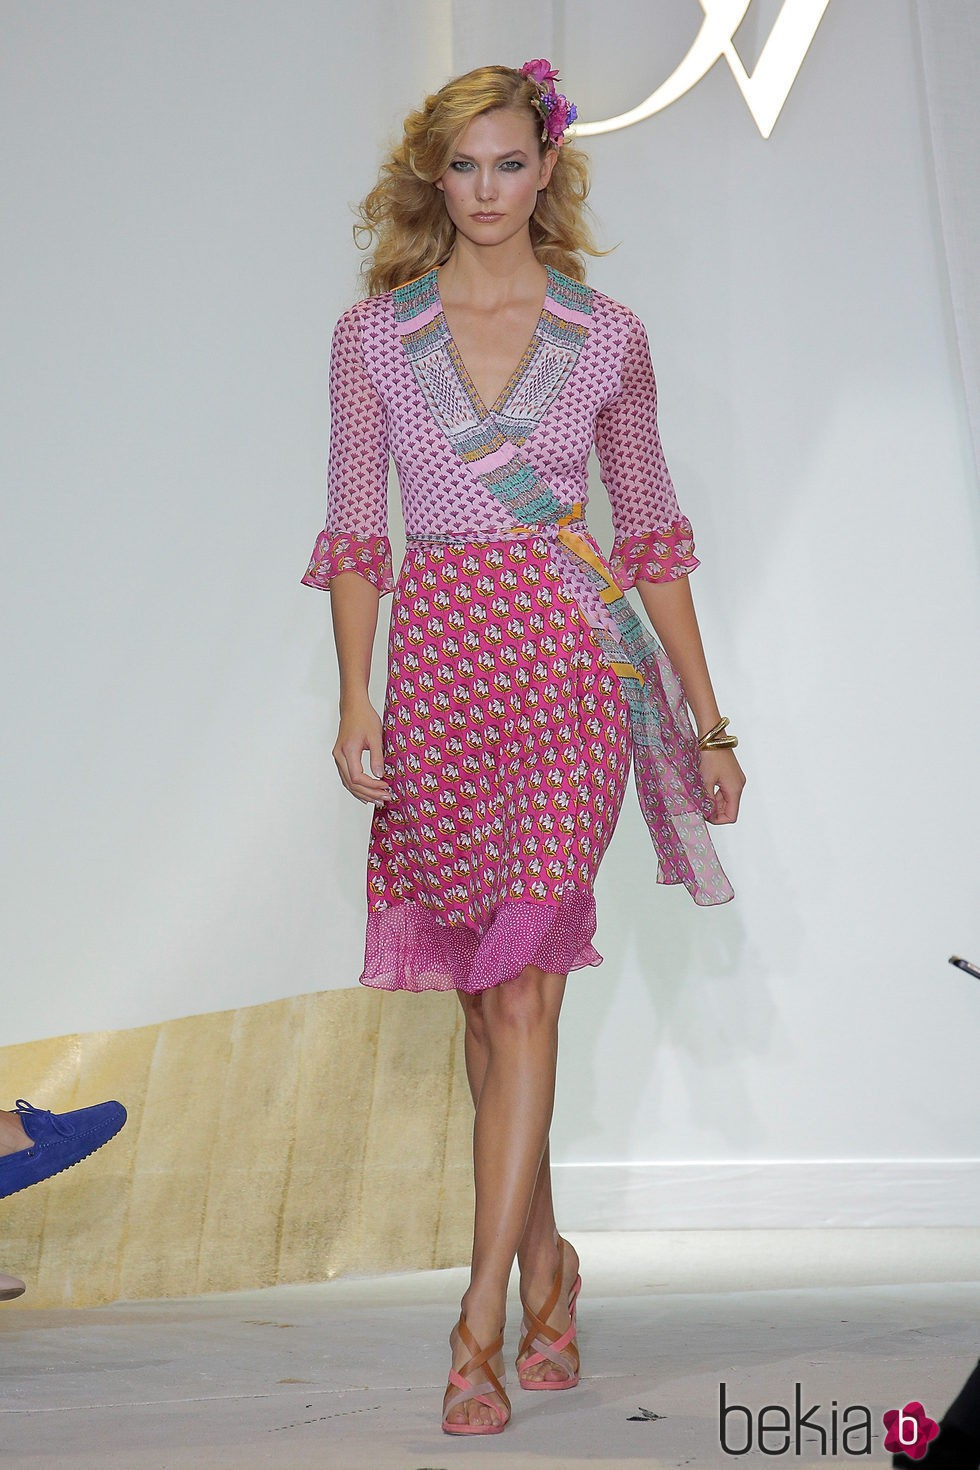 Karlie Kloss desfilando para Diane Von Furstenberg en la Nueva York Fashion Week primavera/verano 2016